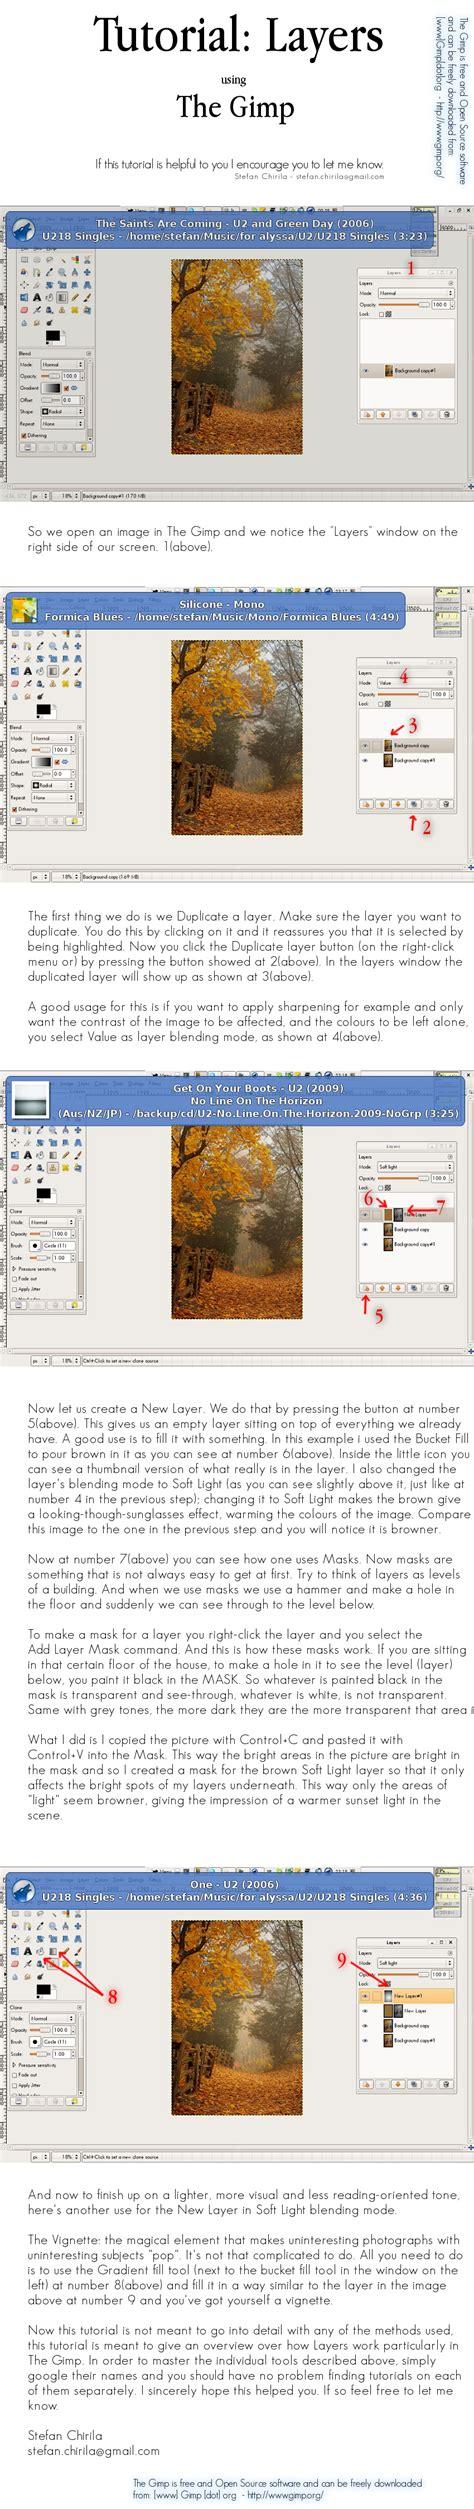 gimp tutorial on layers grandview photo